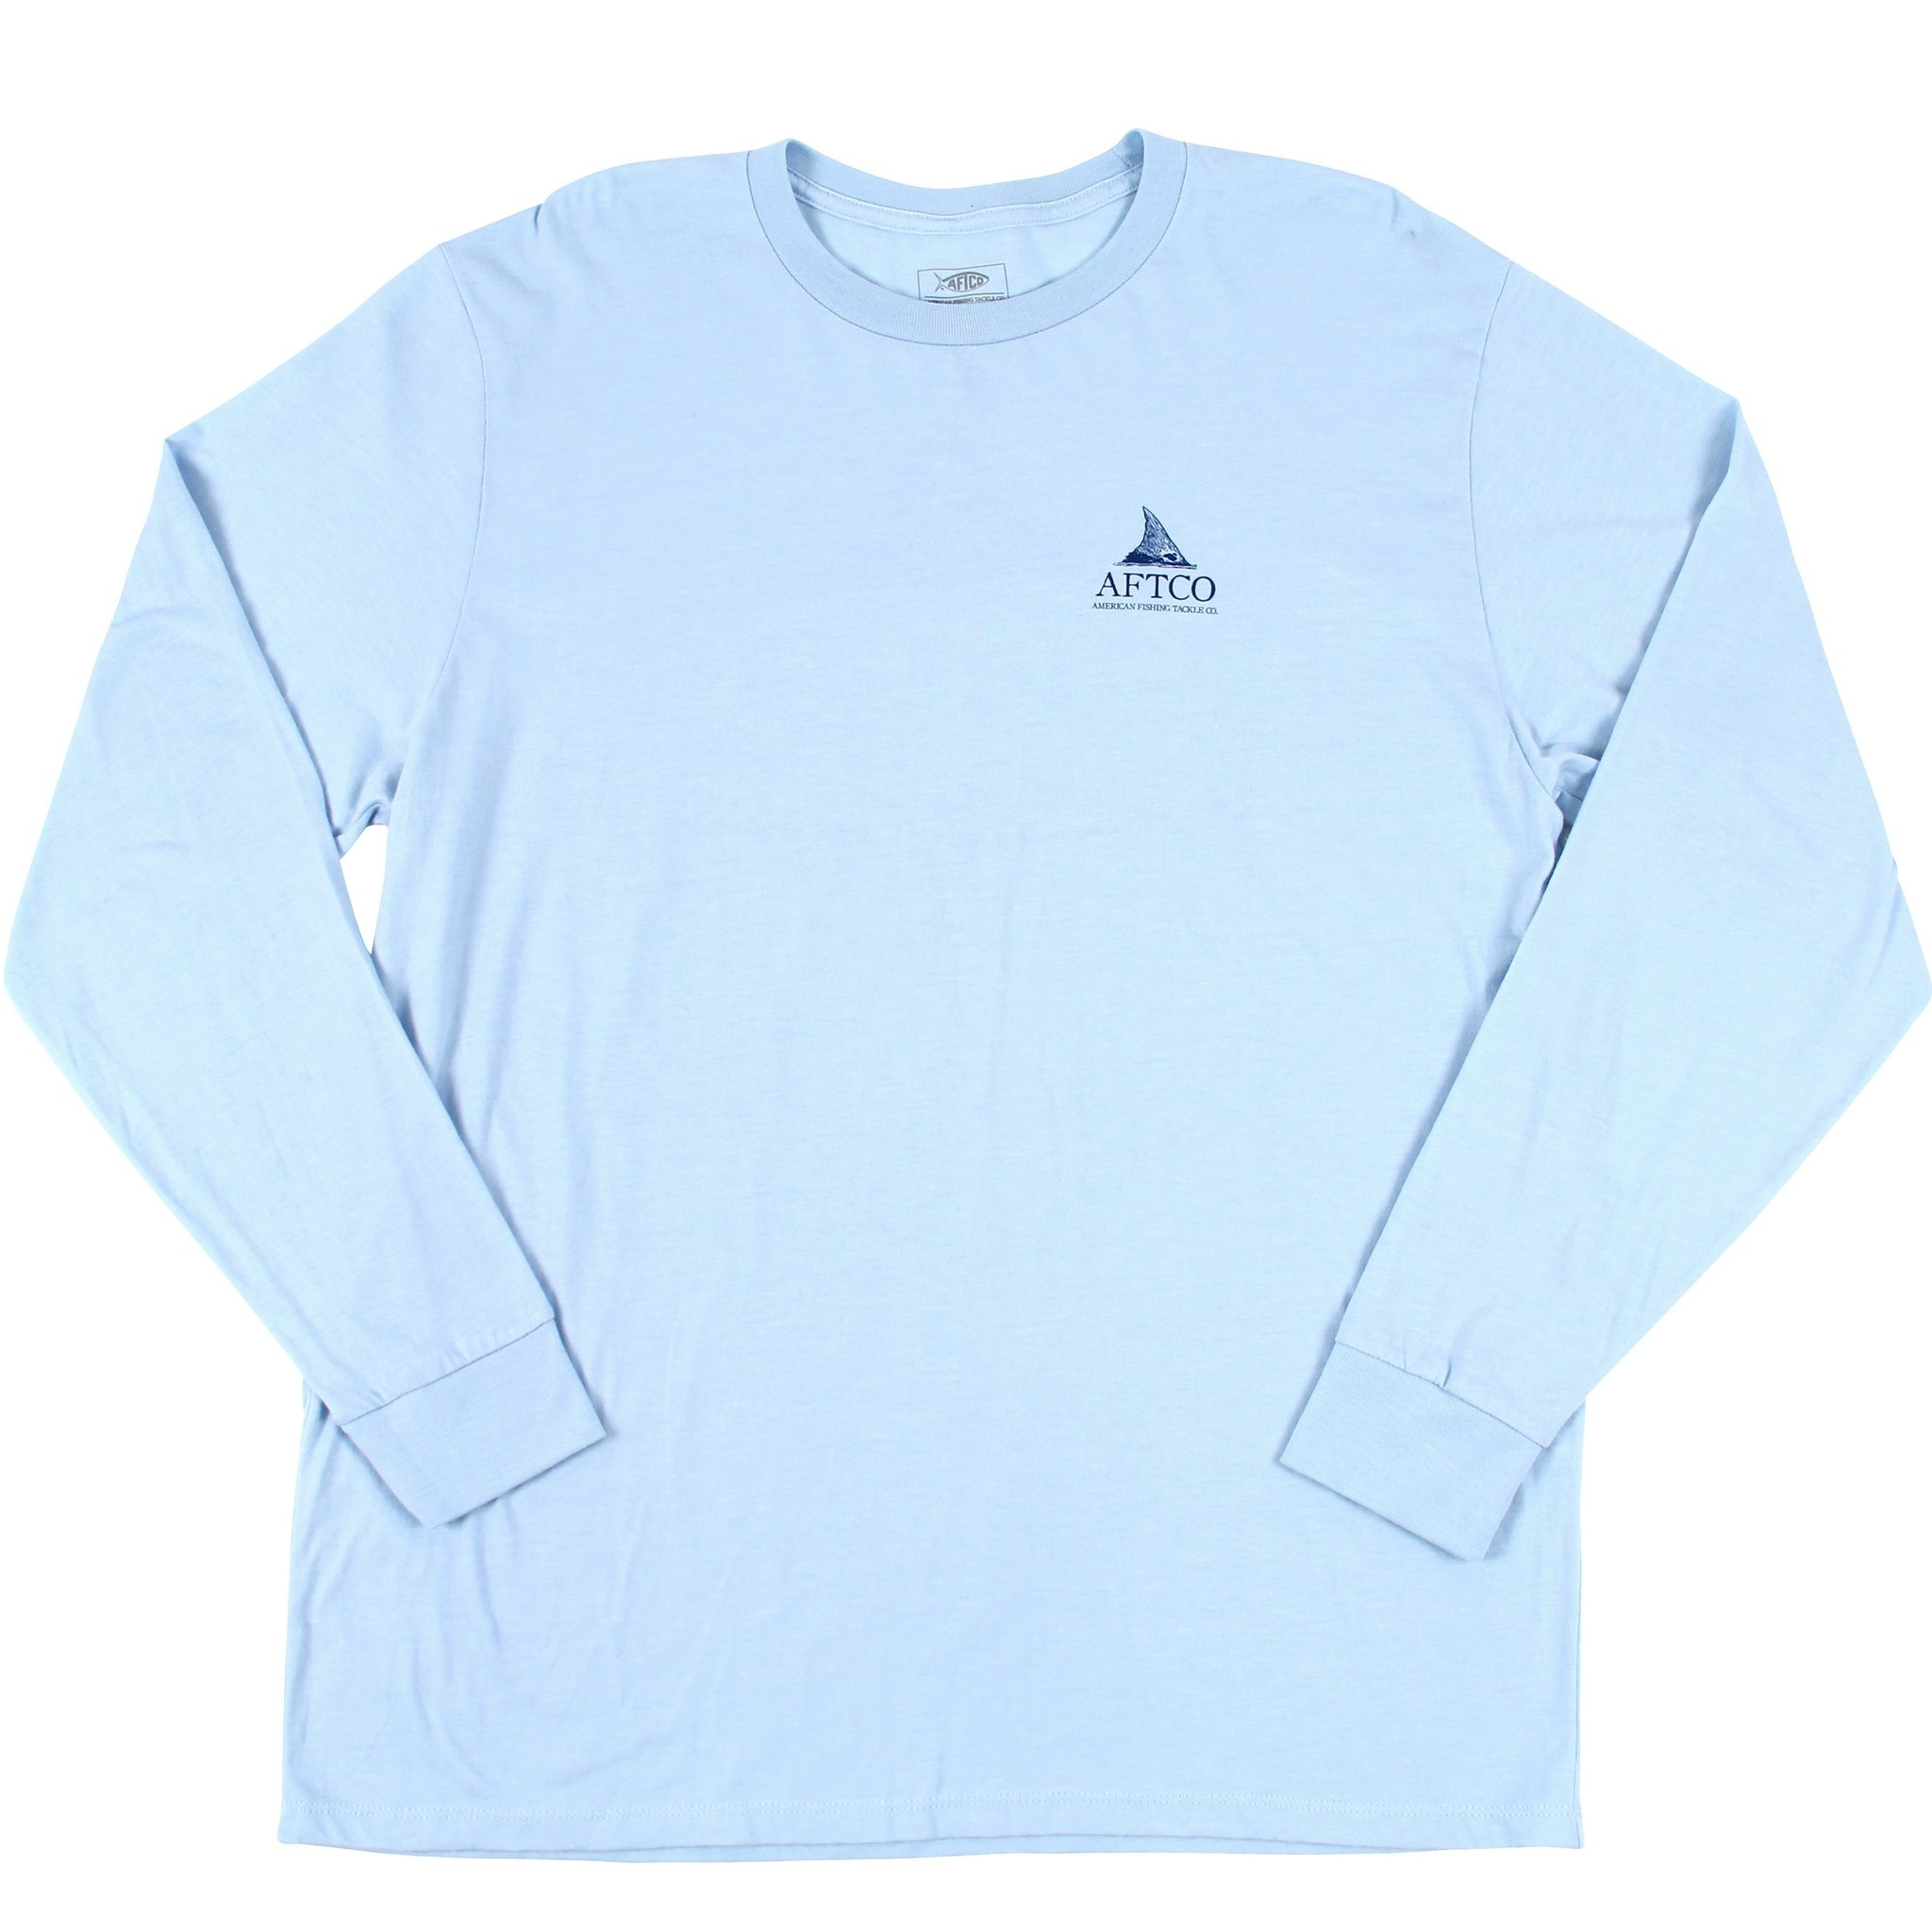 AFTCO Tall Tail LS T-Shirt